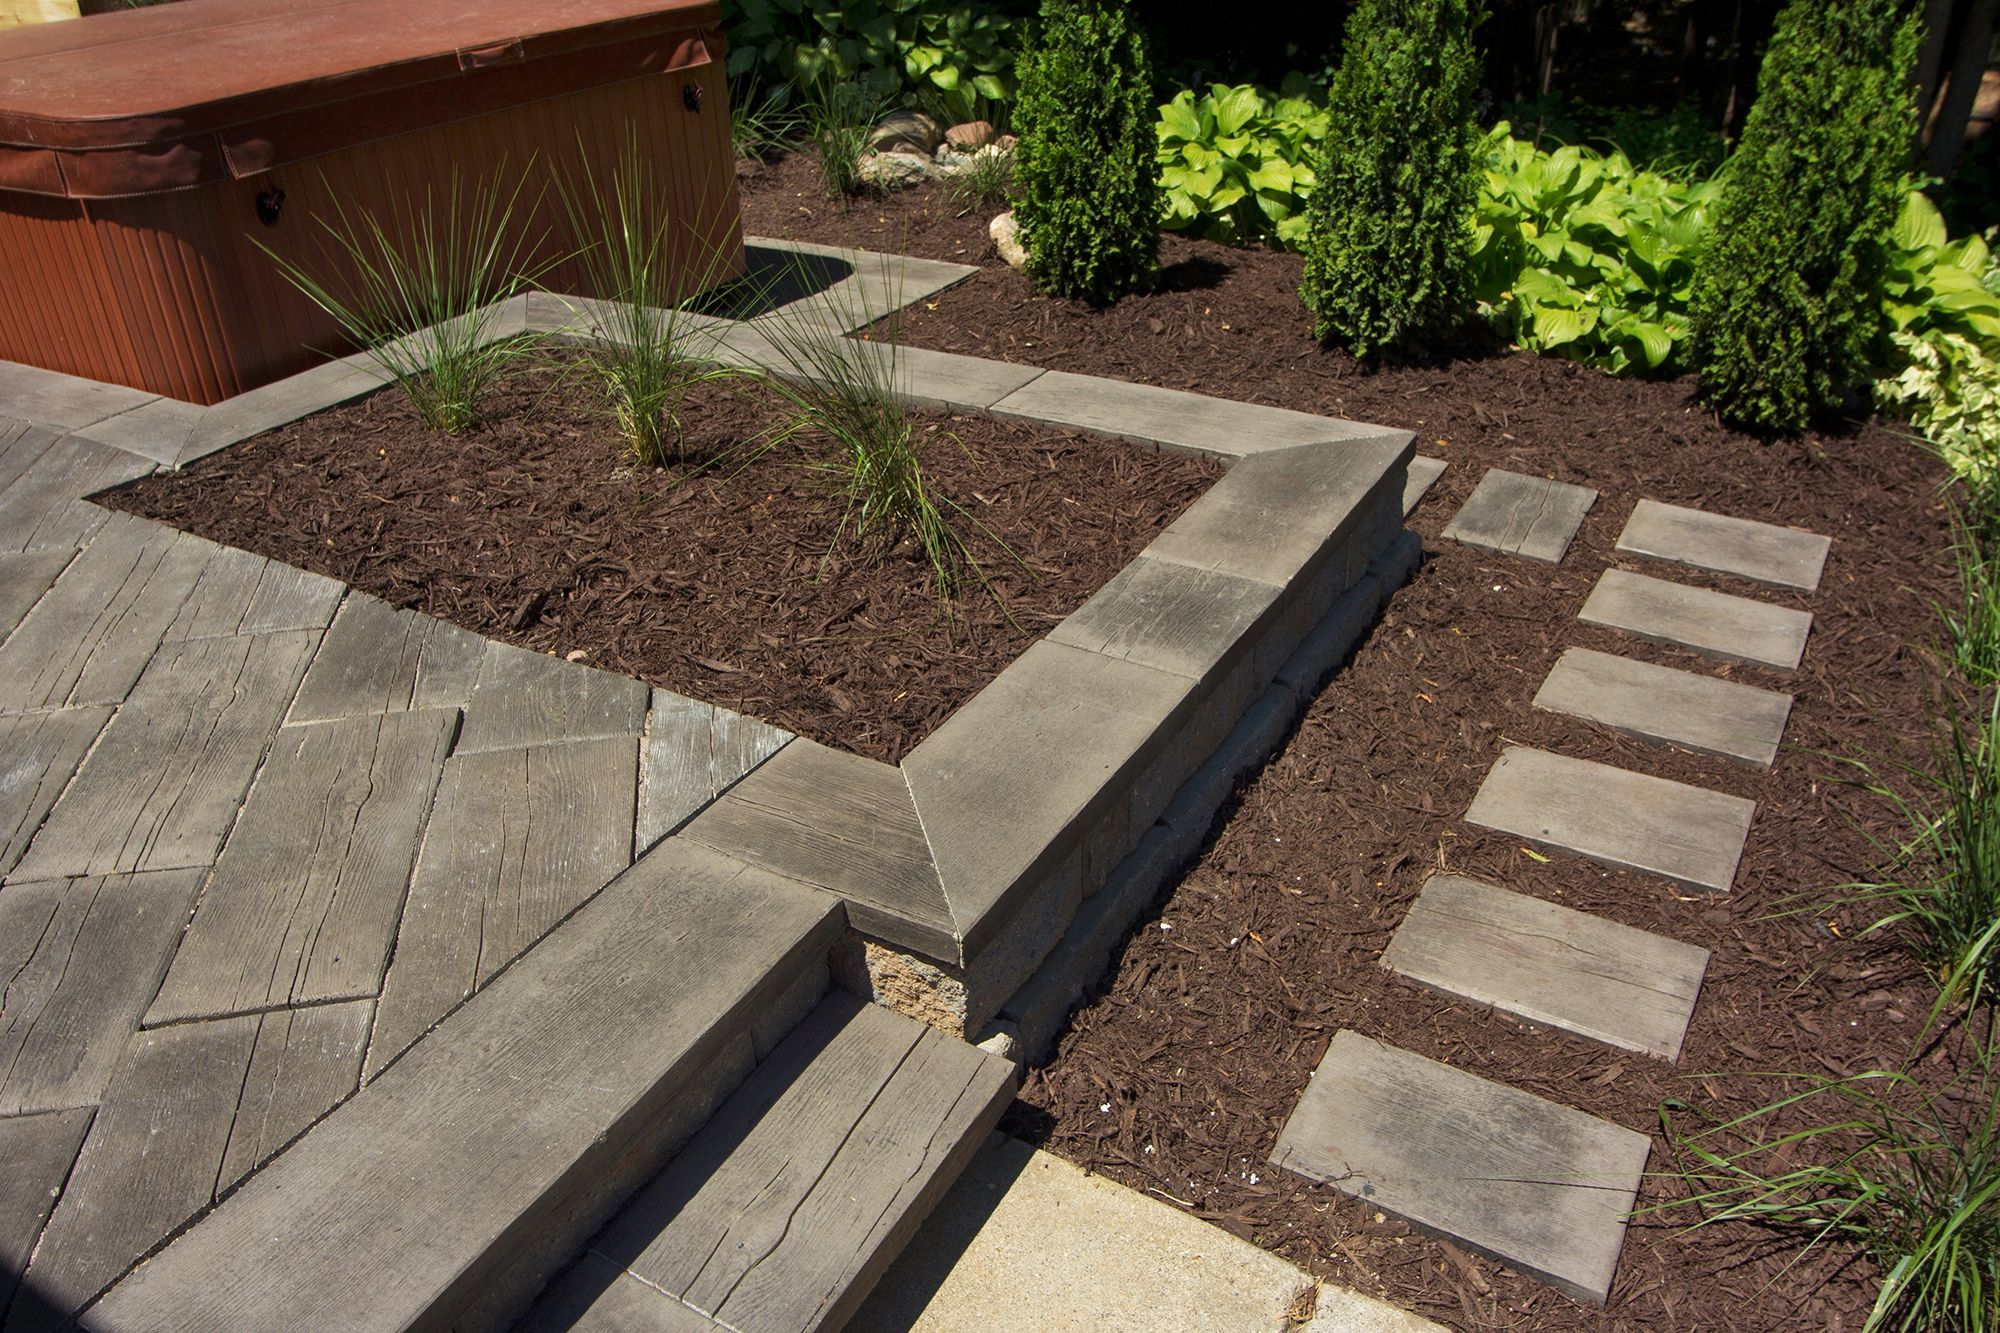 Wood Plank Walkway : Barn plank concrete pavers back yard ideas pinterest